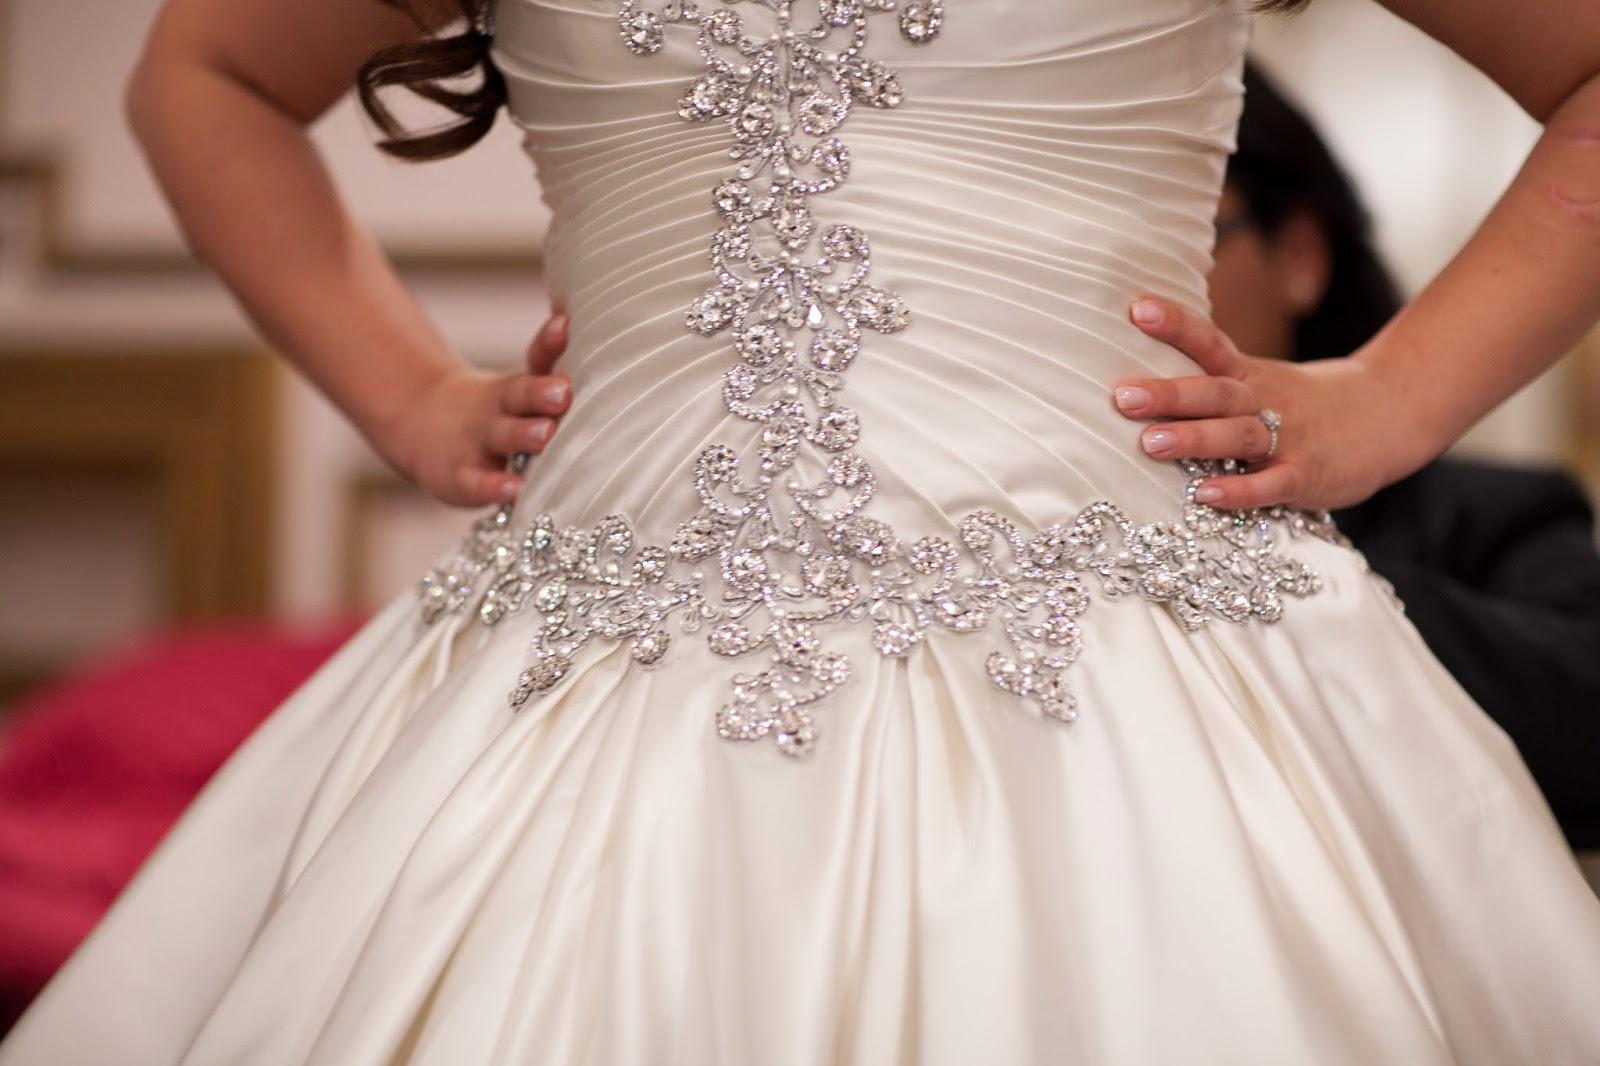 Satin Ball Gown Wedding Dress: Life With Aly: My Wedding